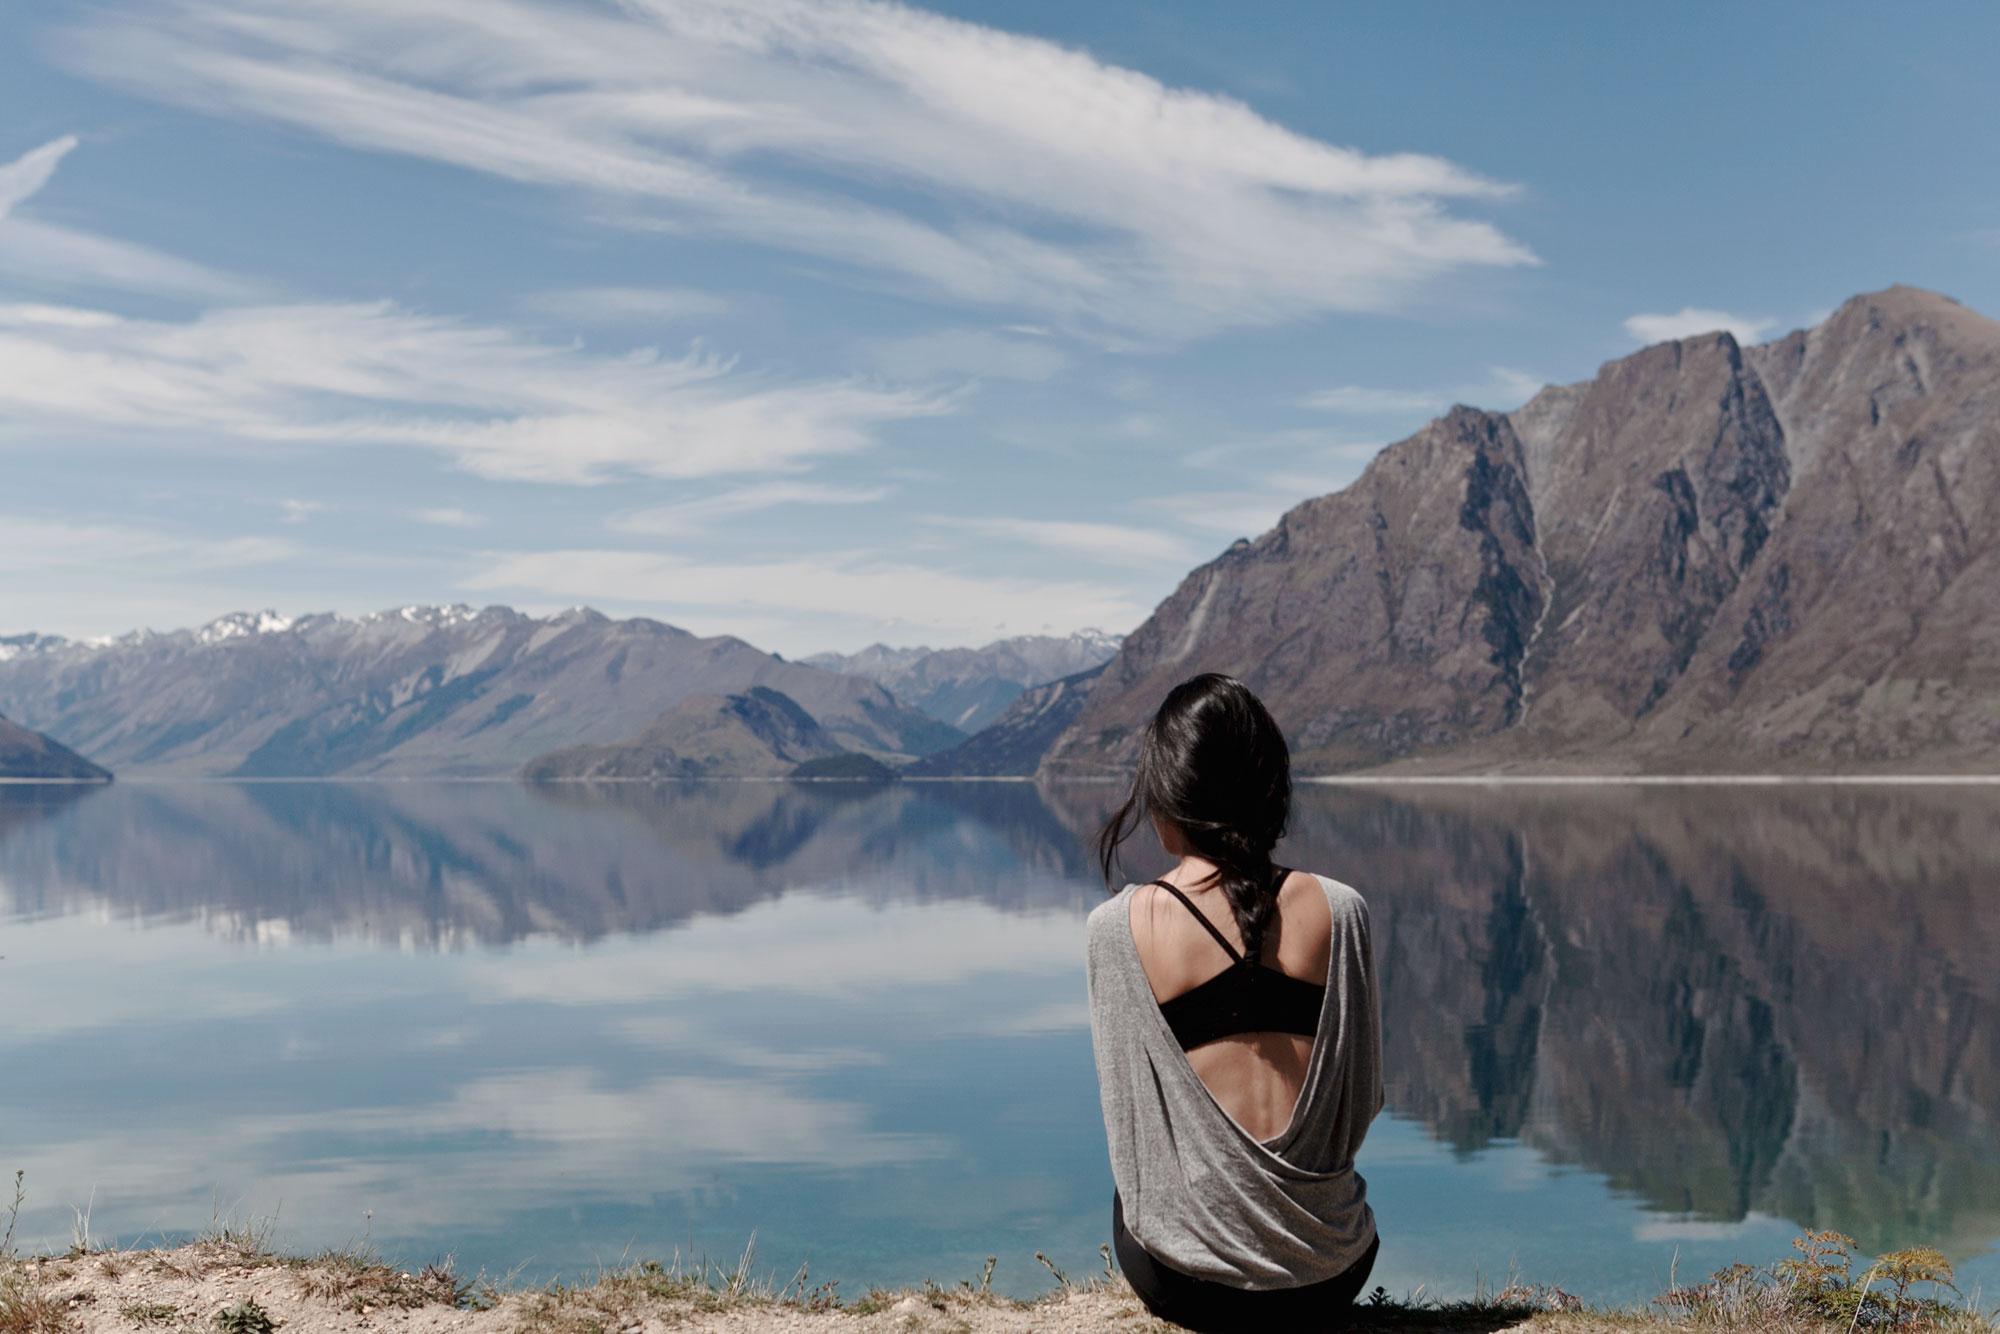 Lake Hawea, NZ, 2015. Photo by Kevin.